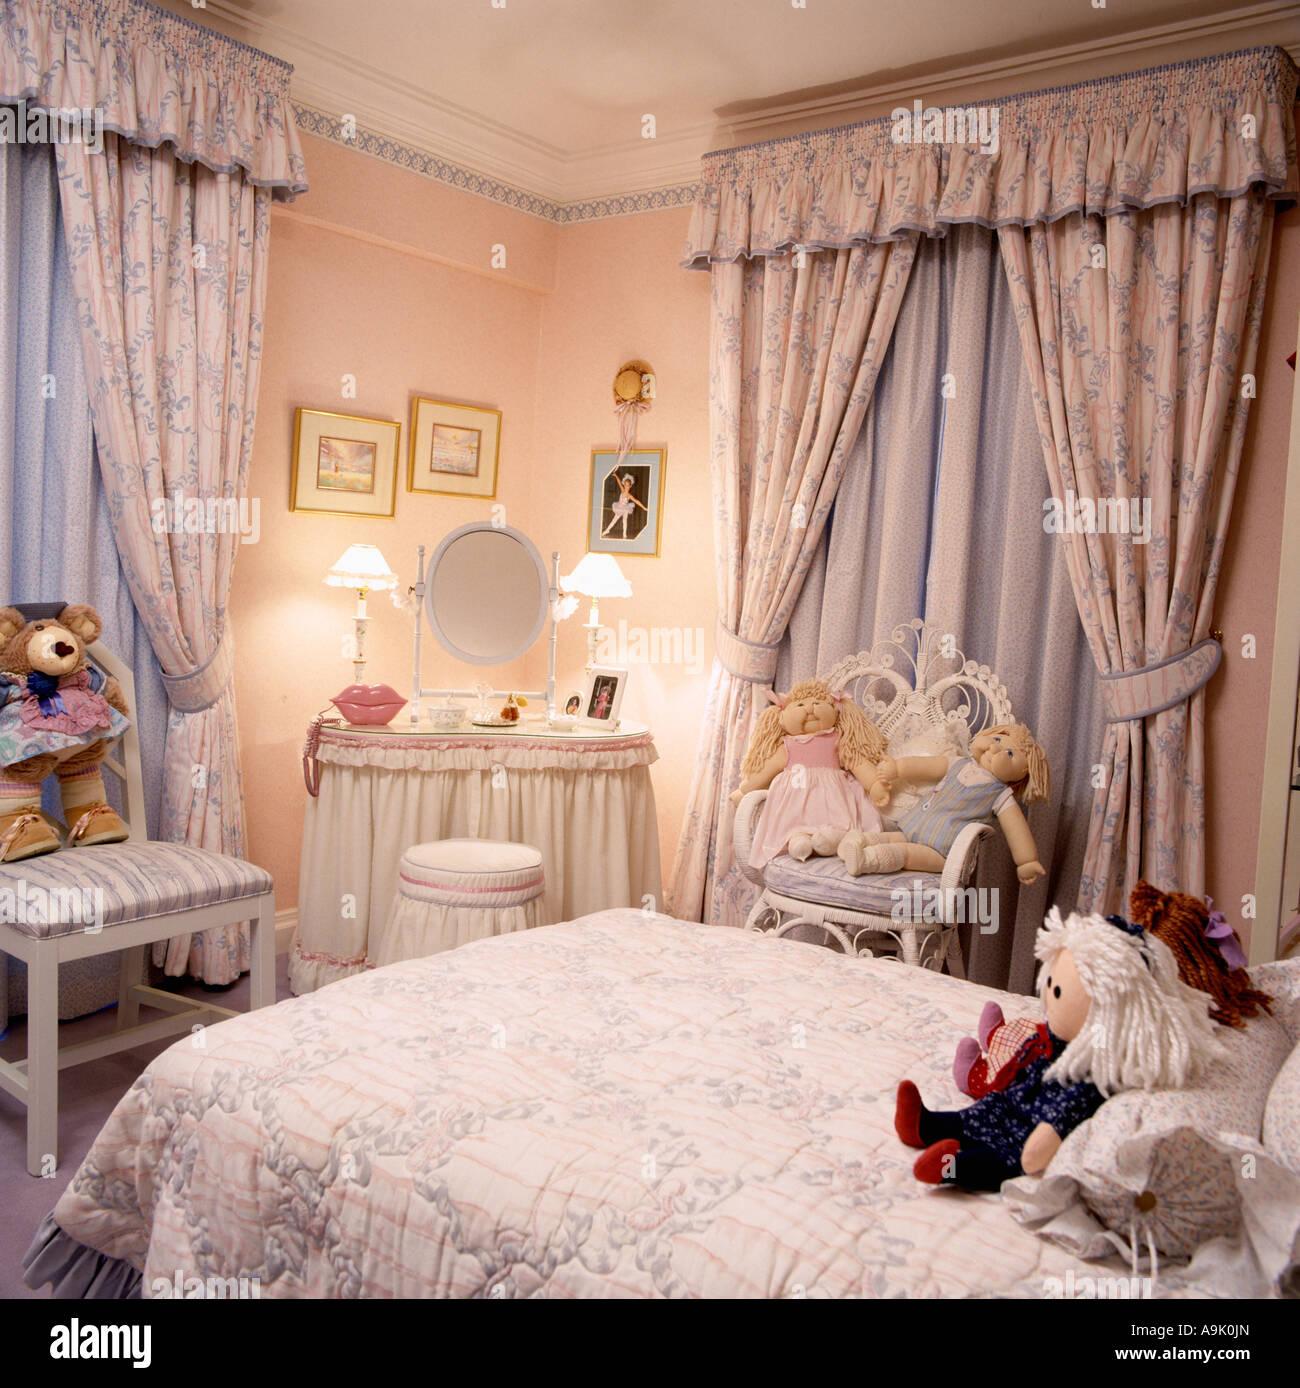 Lamps on skirted dressingtable in teenage girl\'s bedroom ...